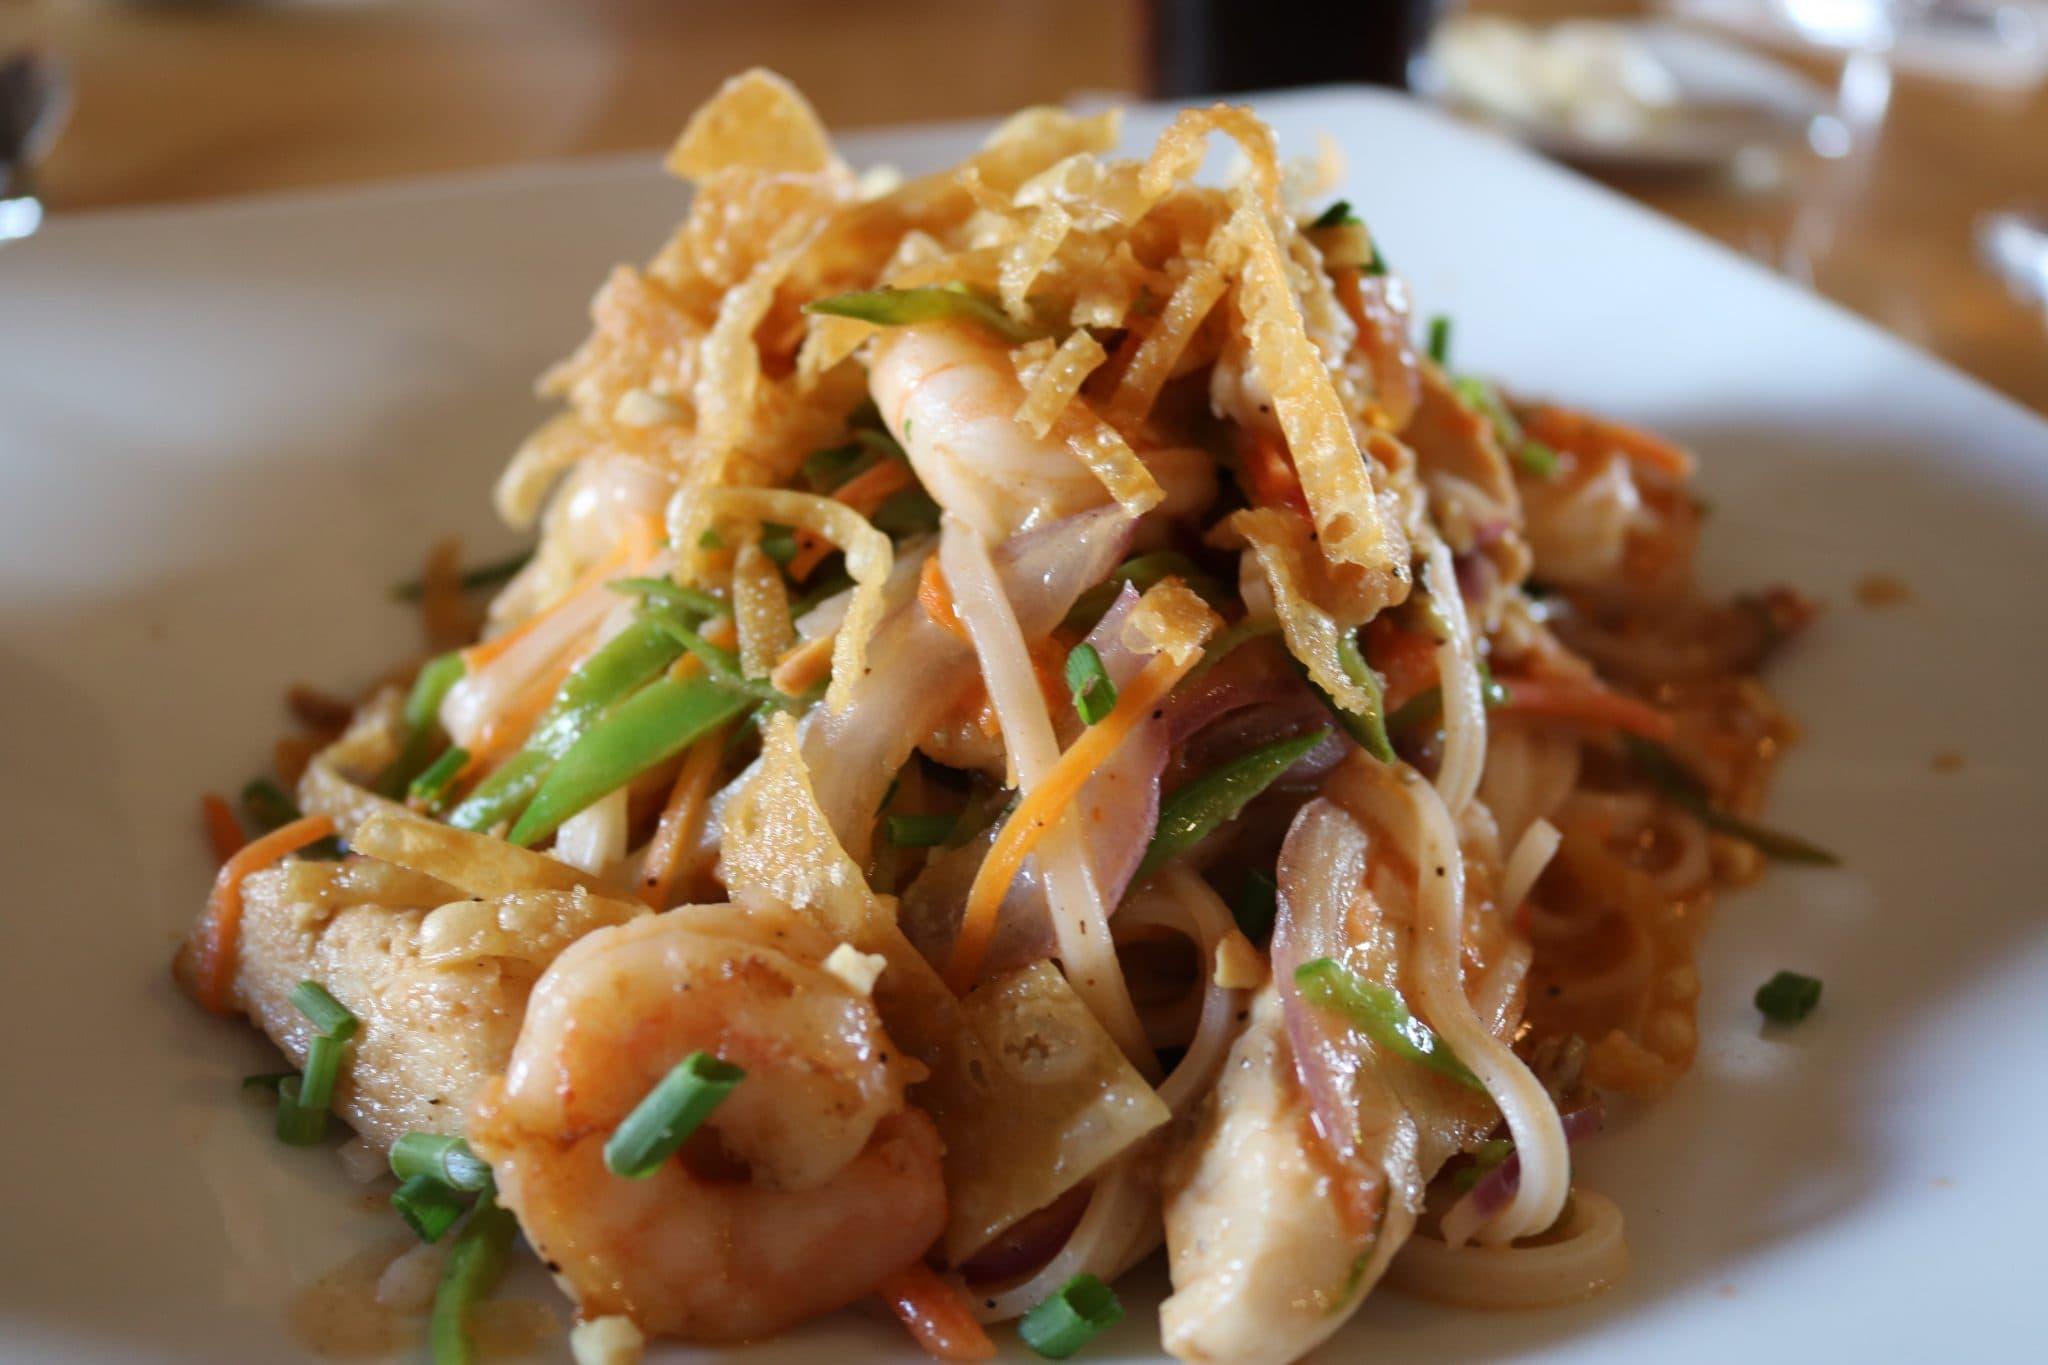 Delicious Pad Thai at Mythos restaurant